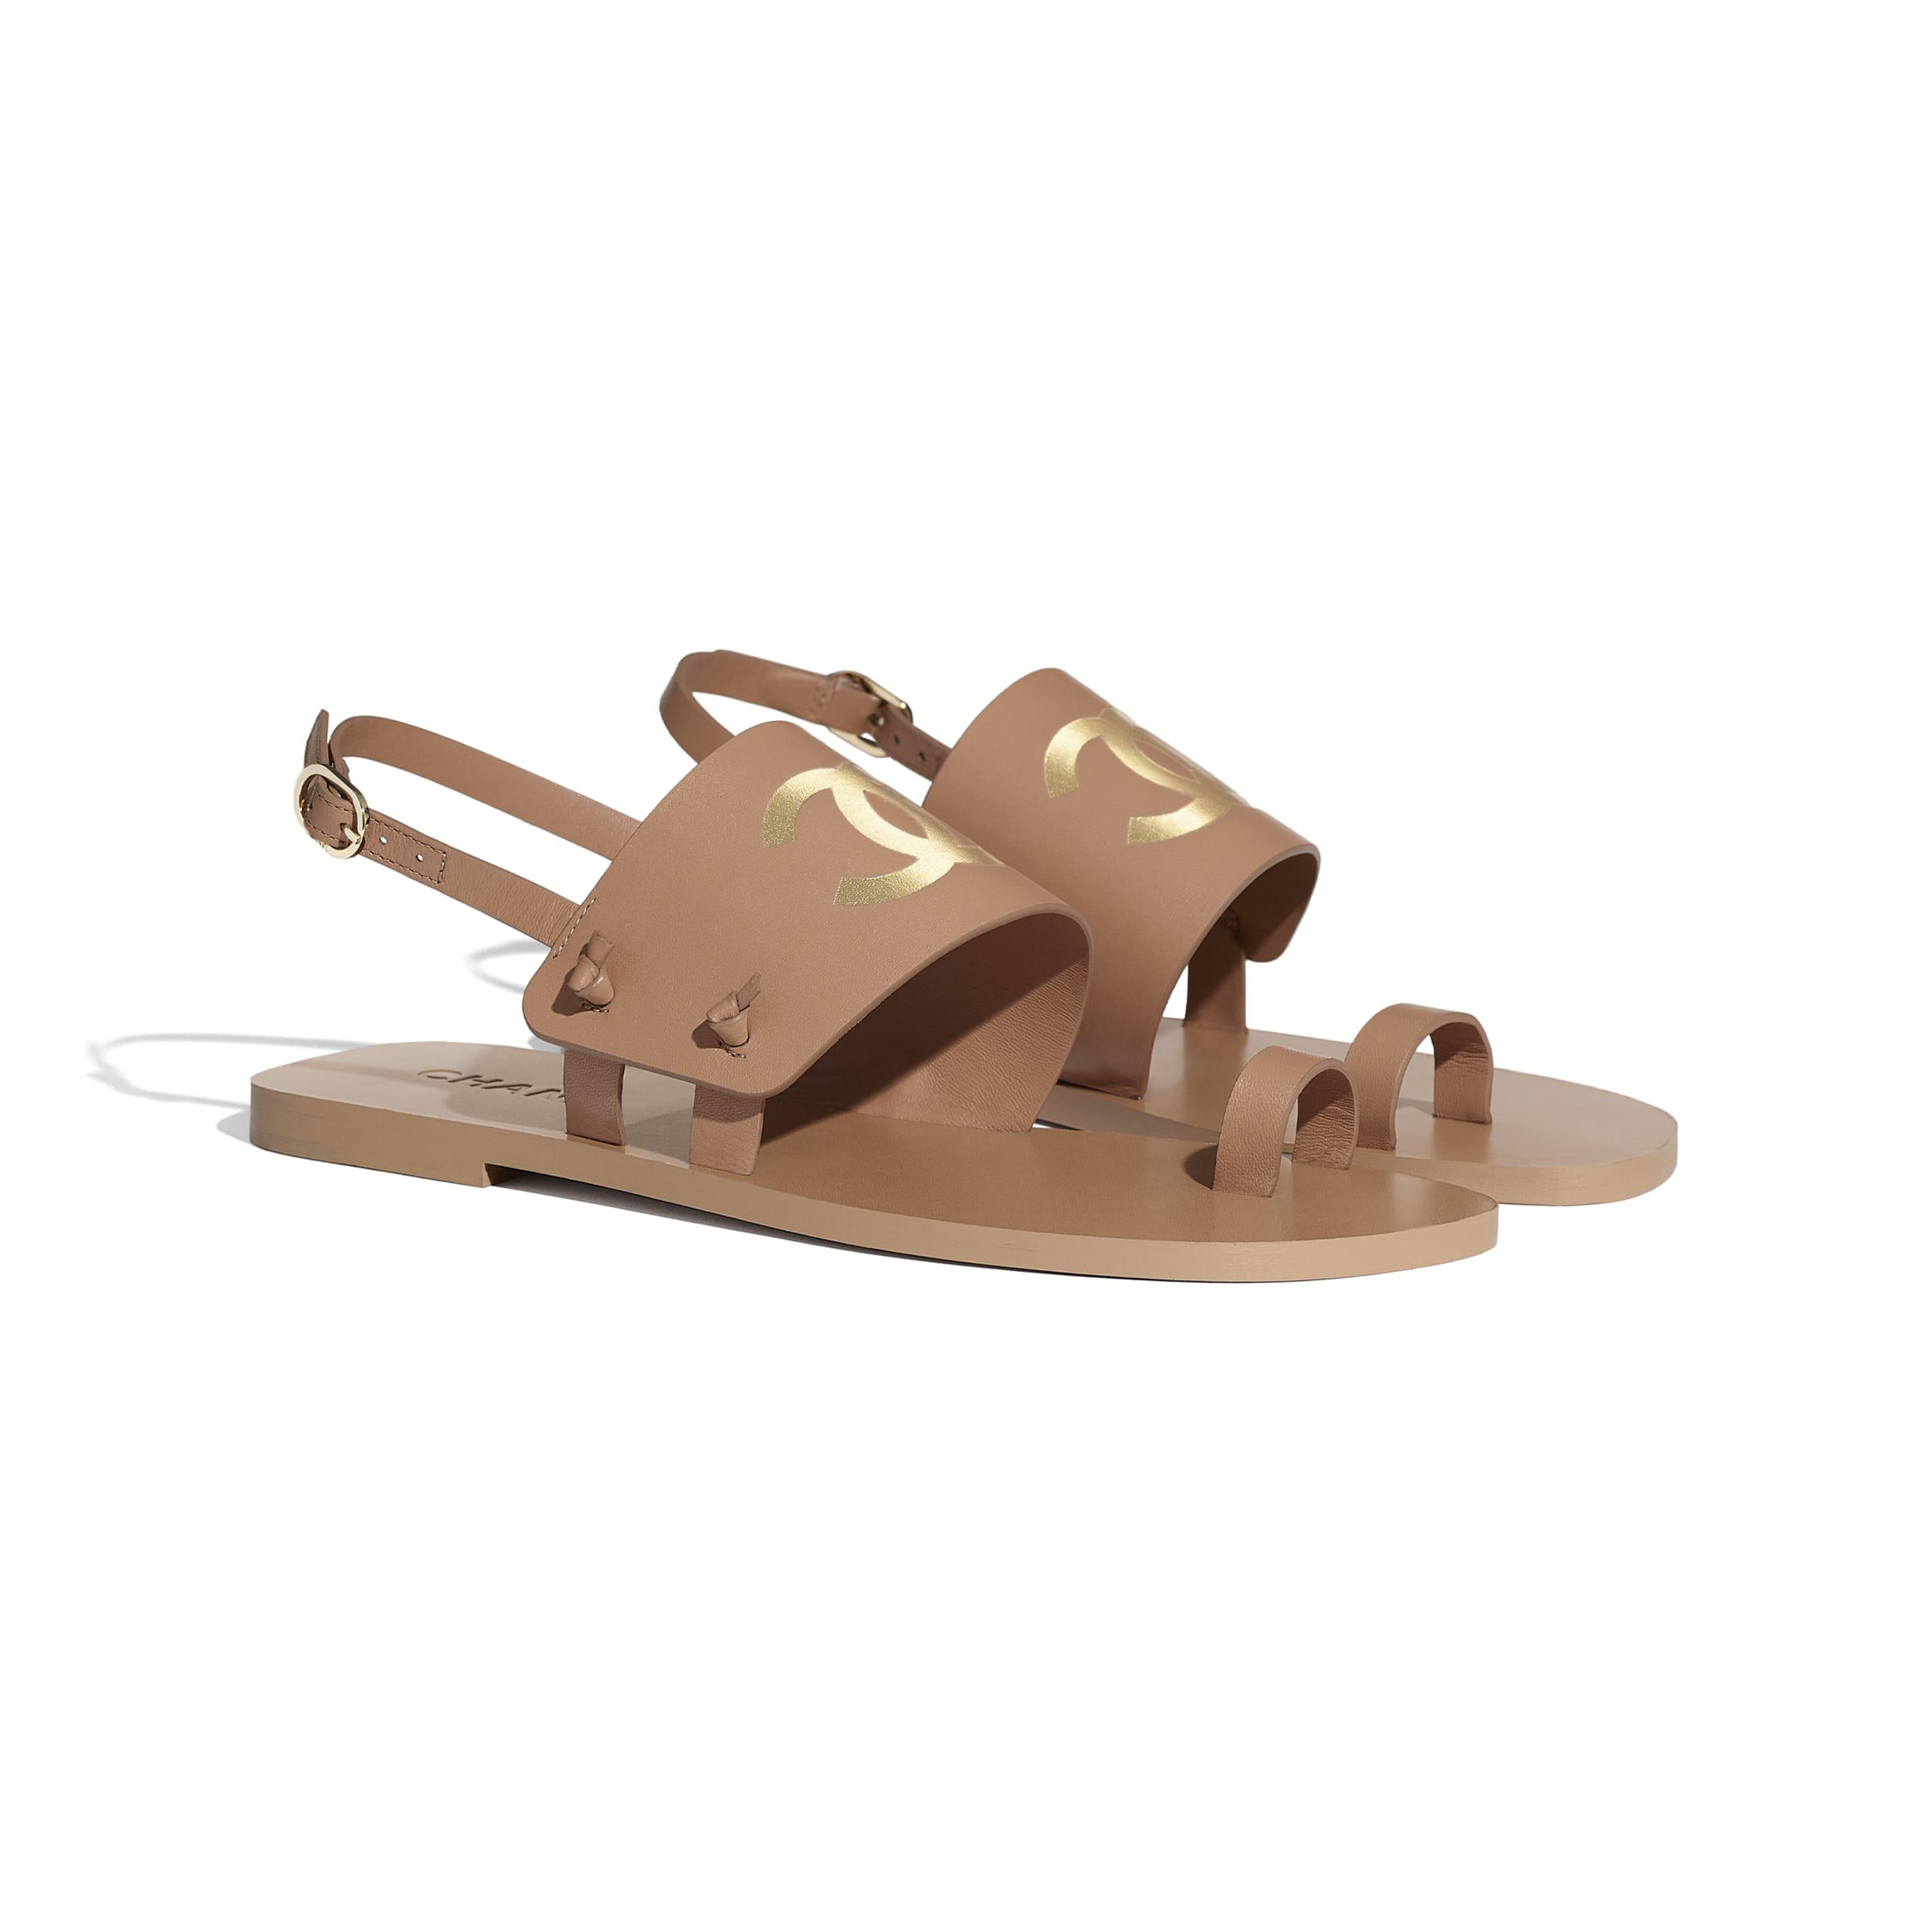 Sandals - Brown - Goatskin - CHANEL - Alternative view - see standard sized version